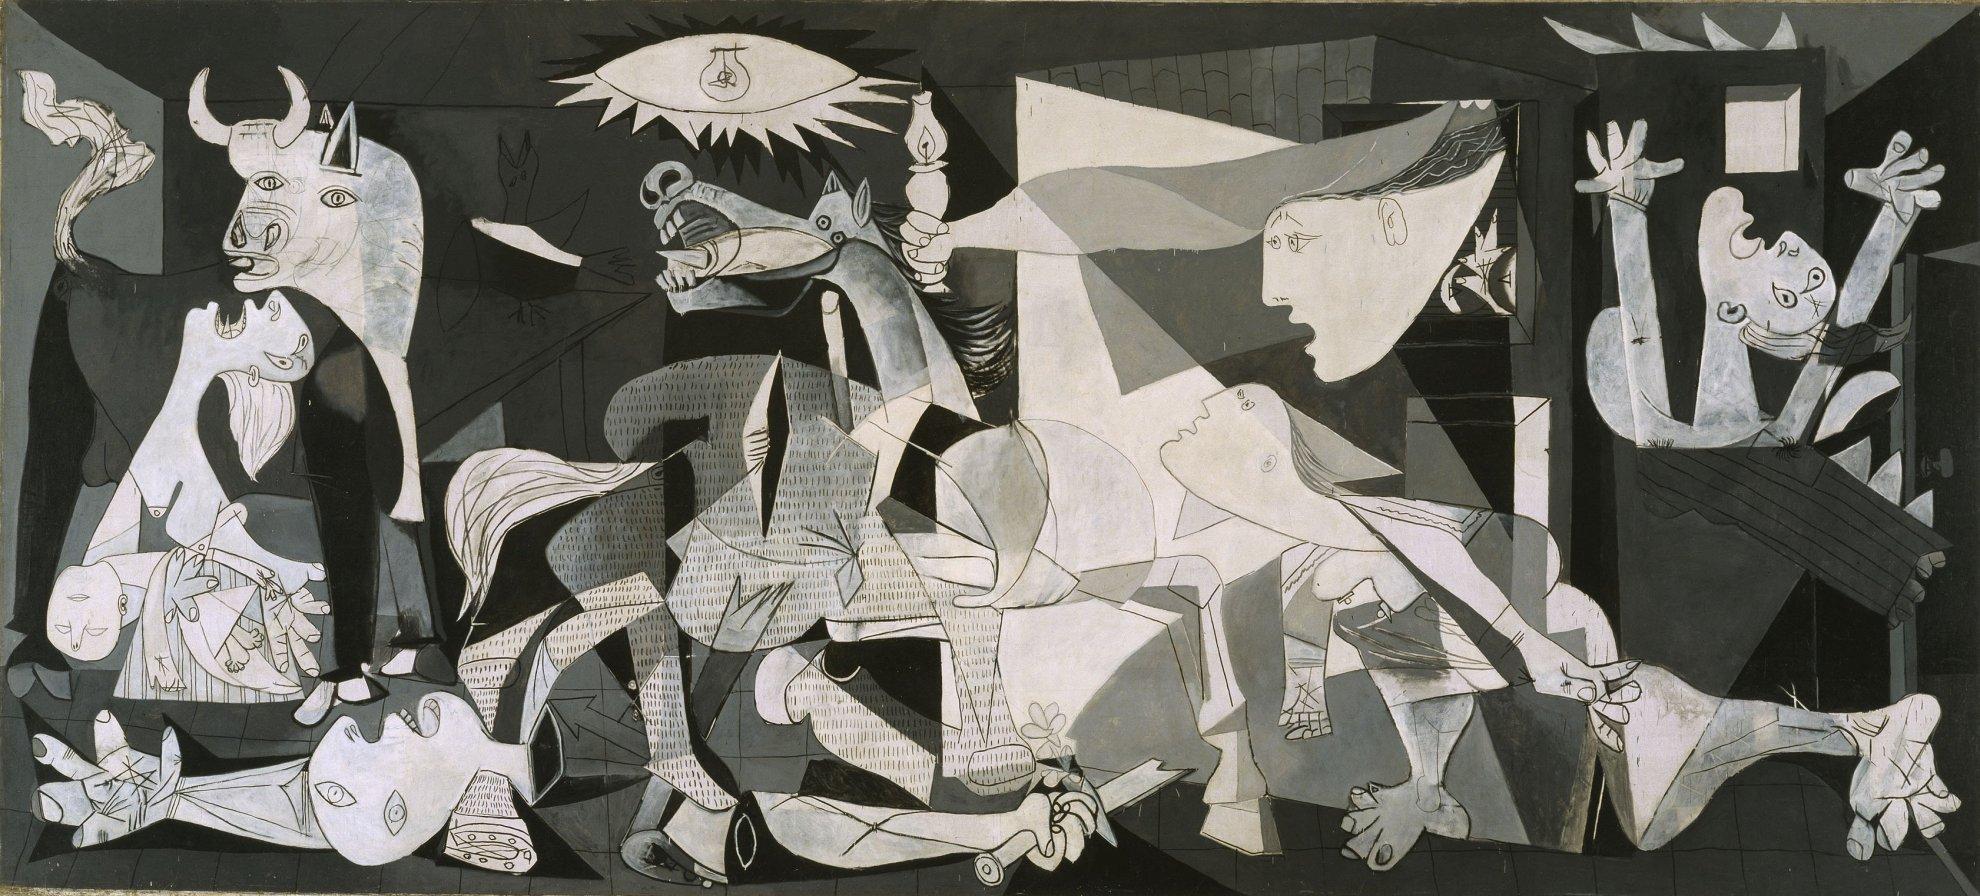 Pablo picassos guernica a symbol against war buycottarizona Gallery